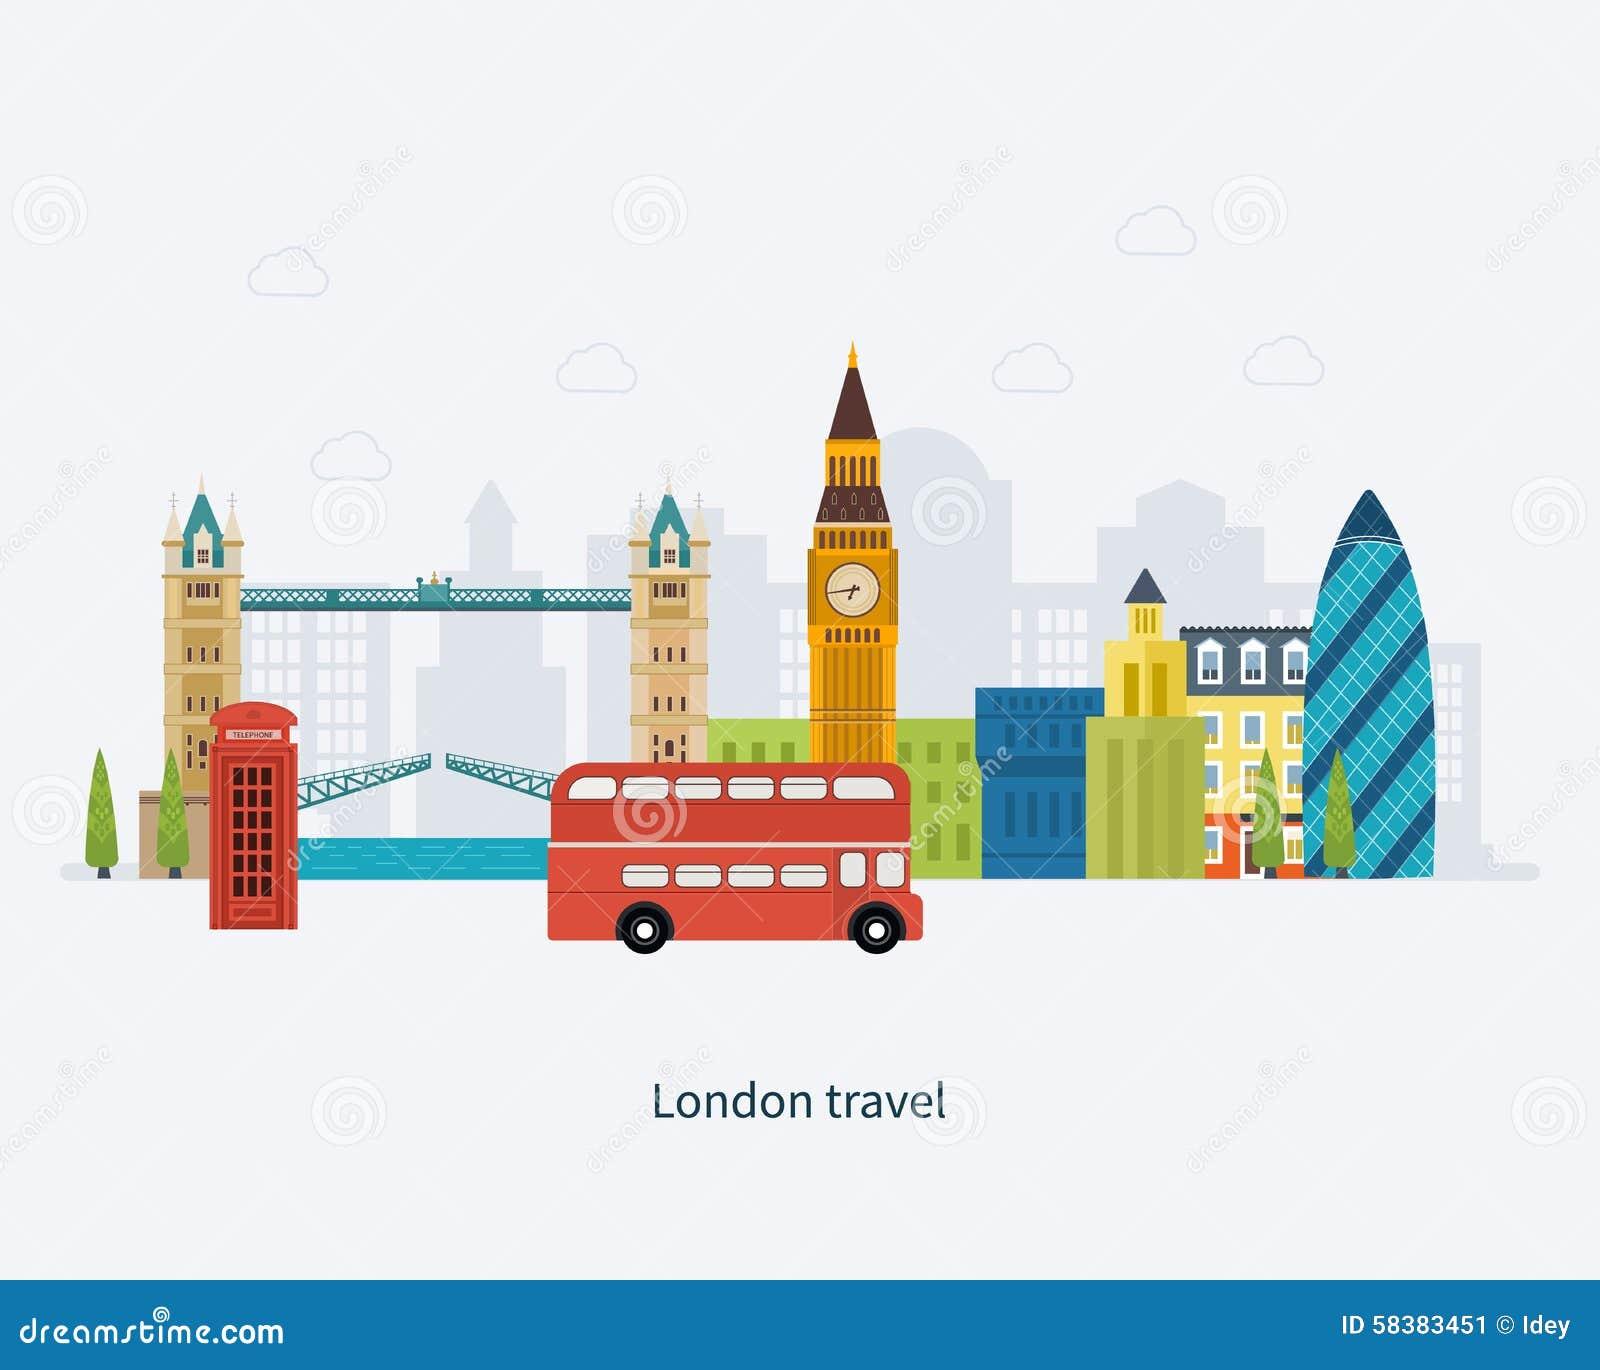 London, United Kingdom flat icons design travel